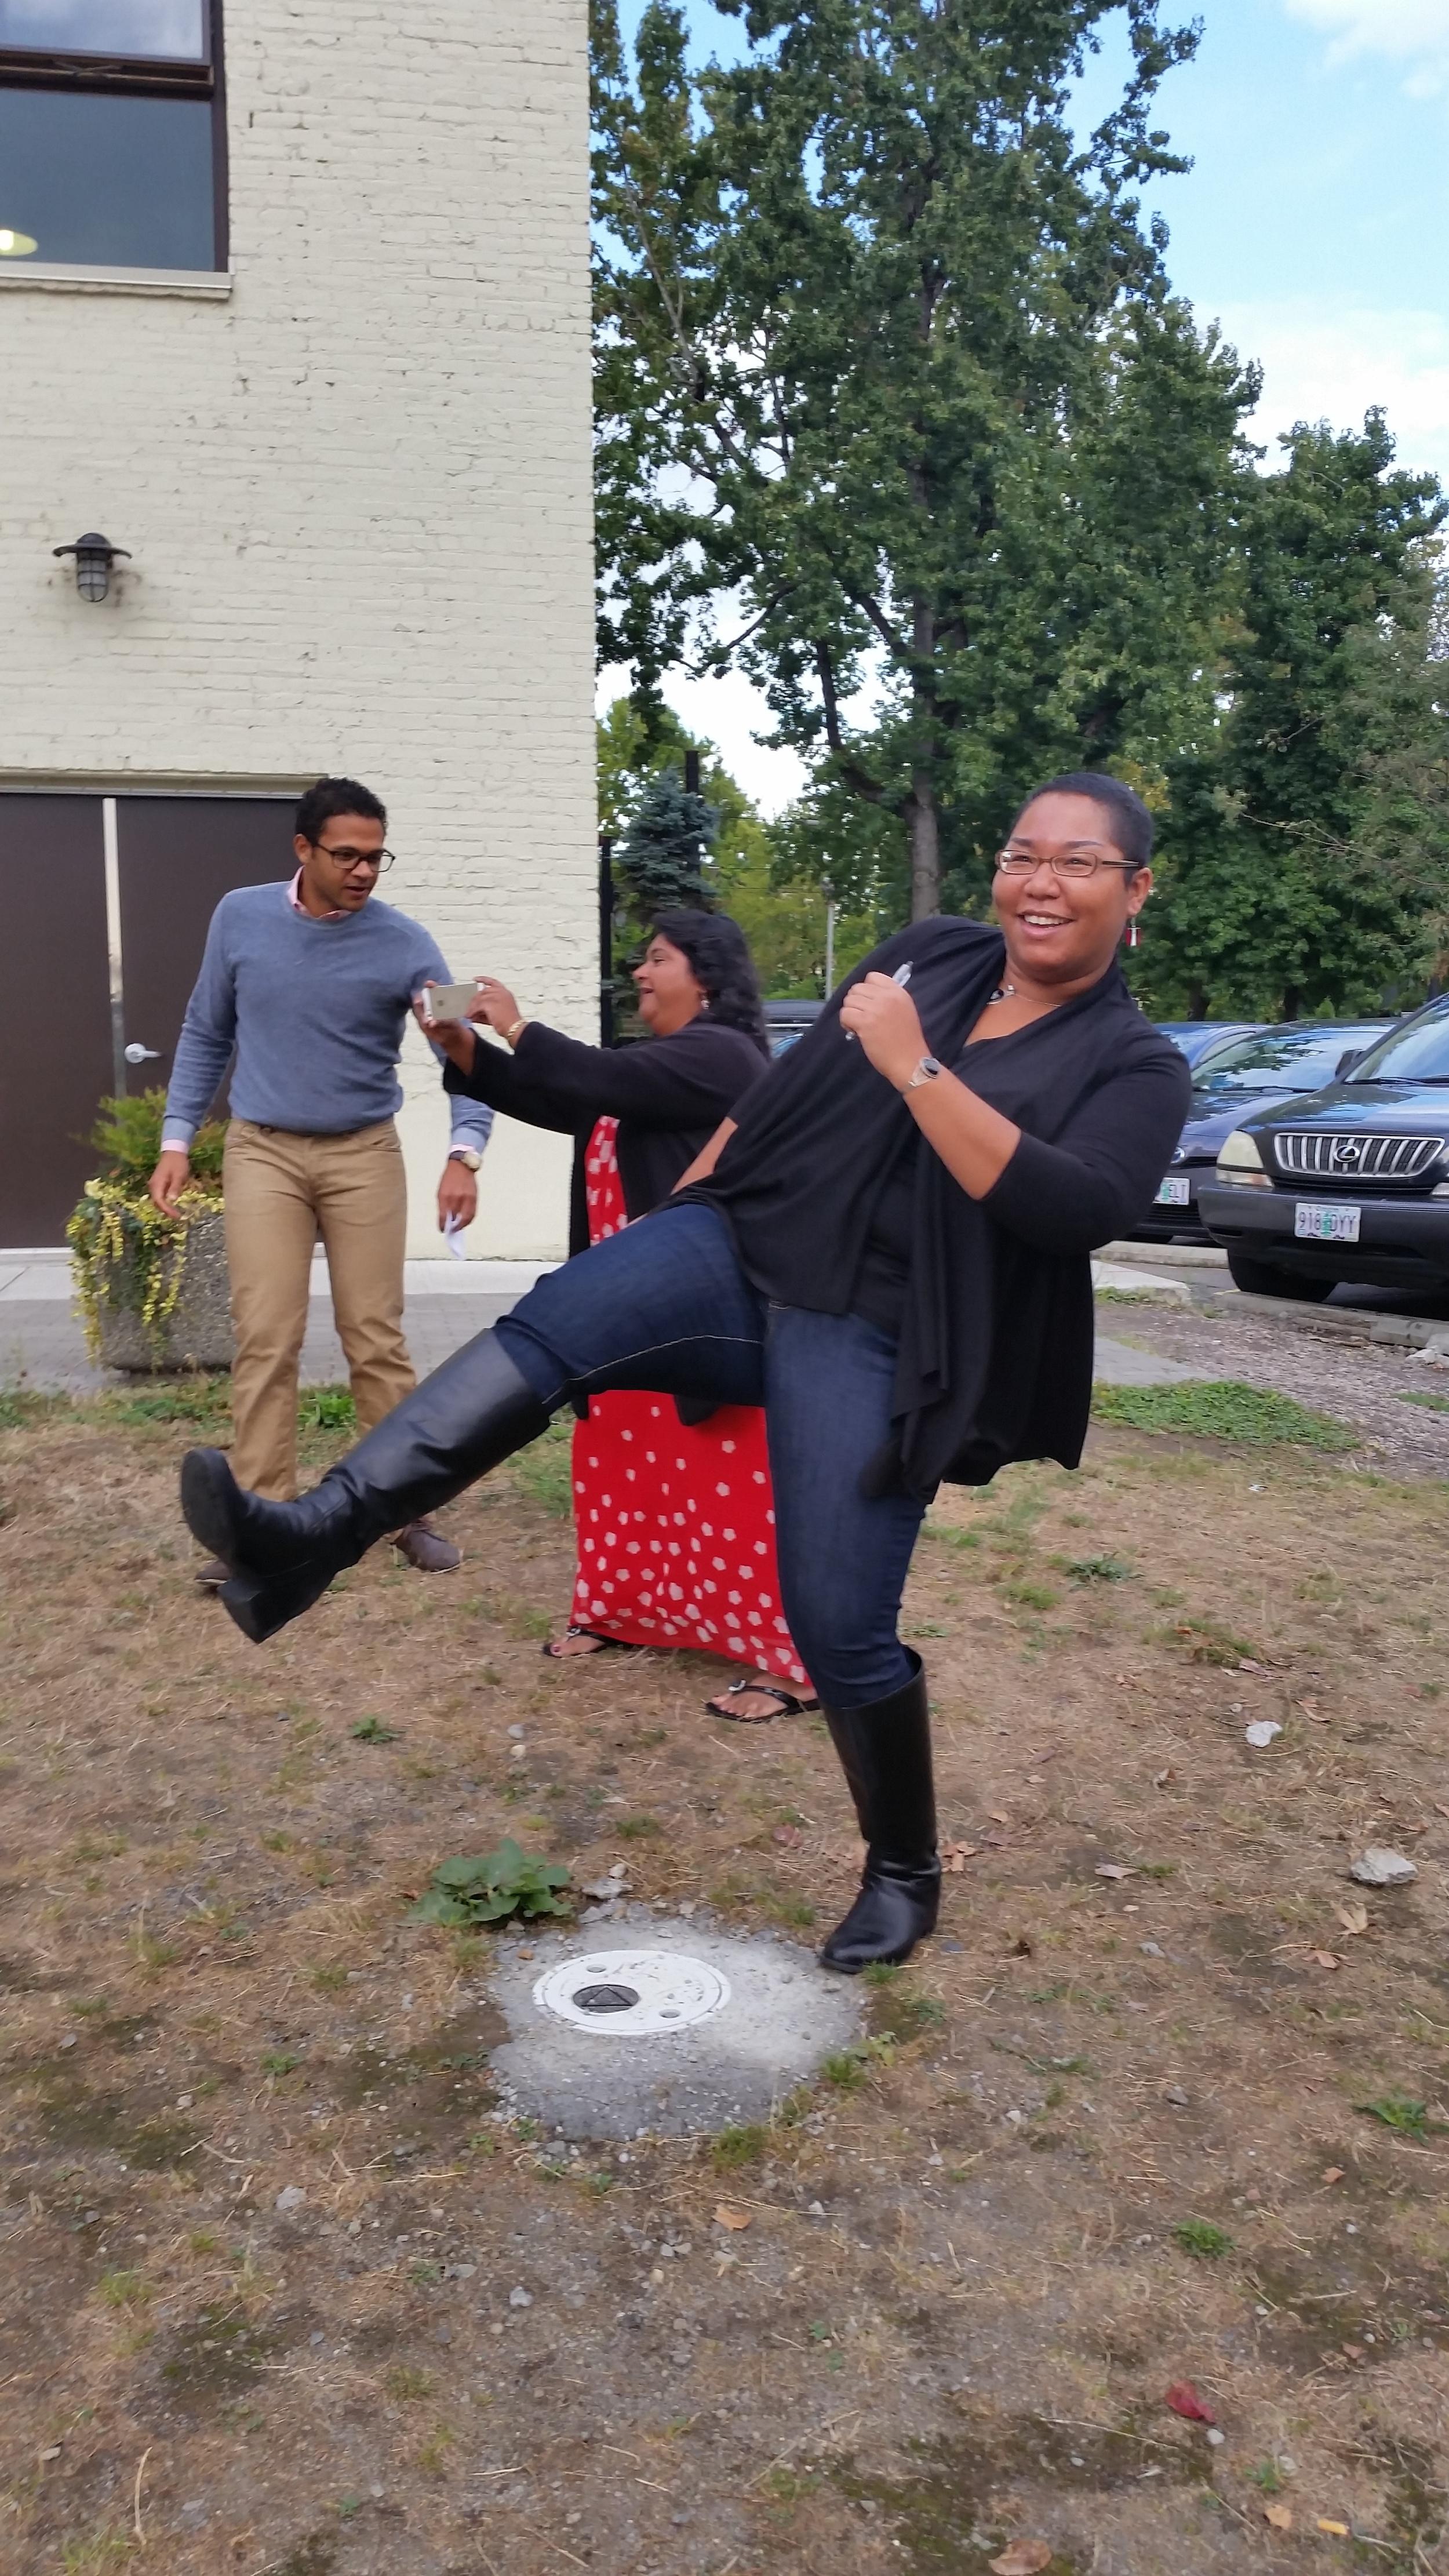 Fannie pretending to kick a kickball.